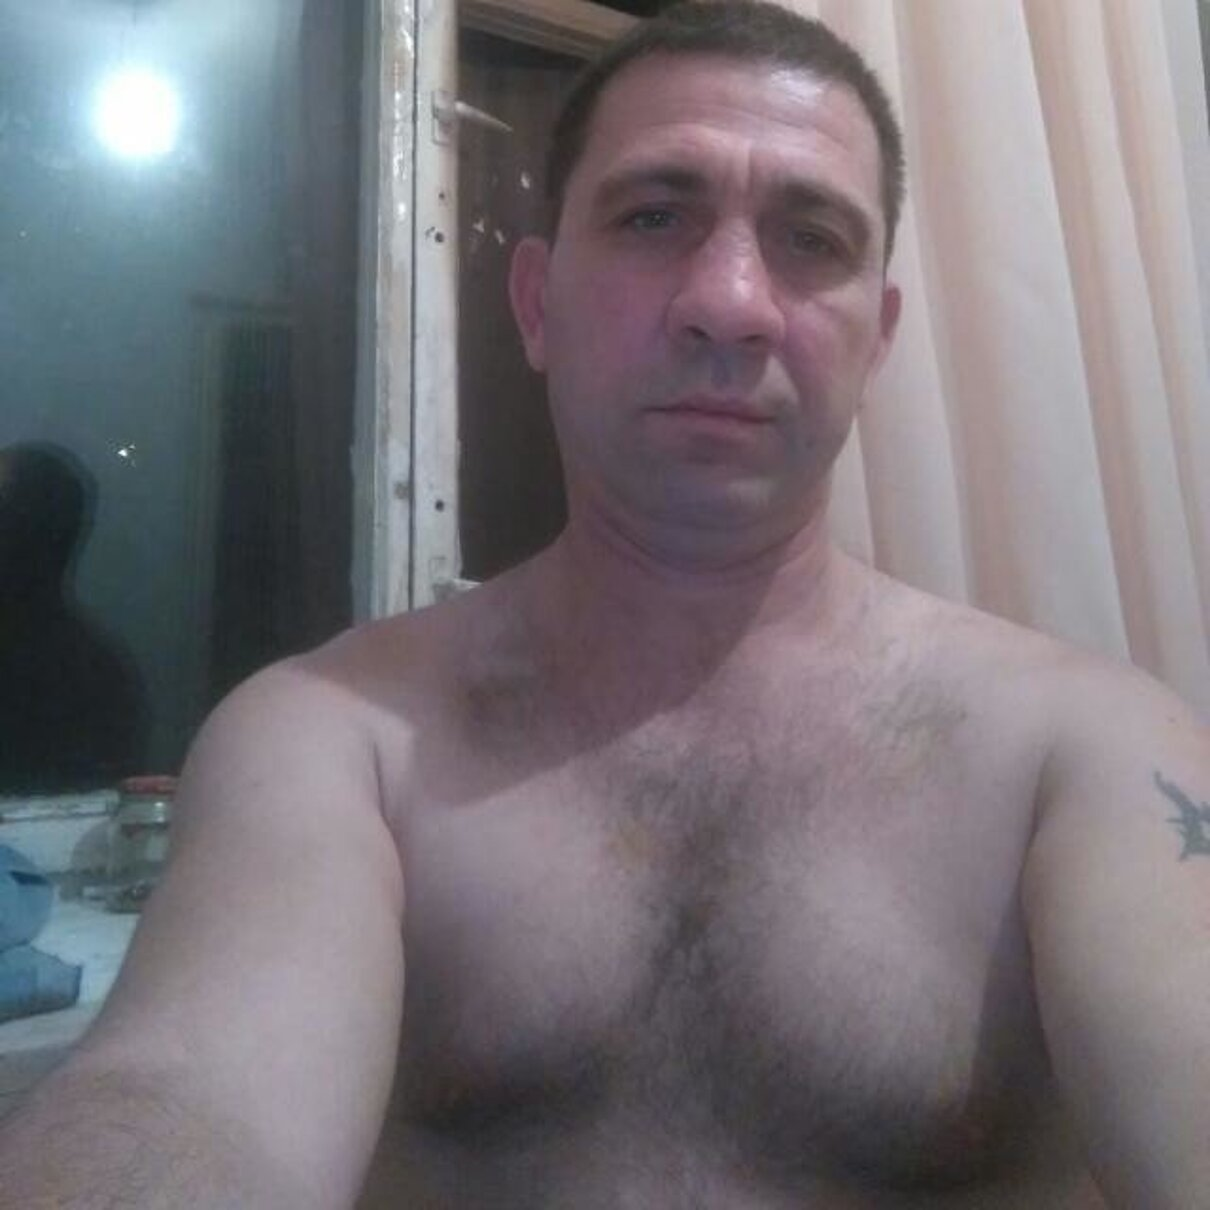 Жалоба-отзыв: Харченко Виталии - Мошенник с саита знакомств.  Фото №1